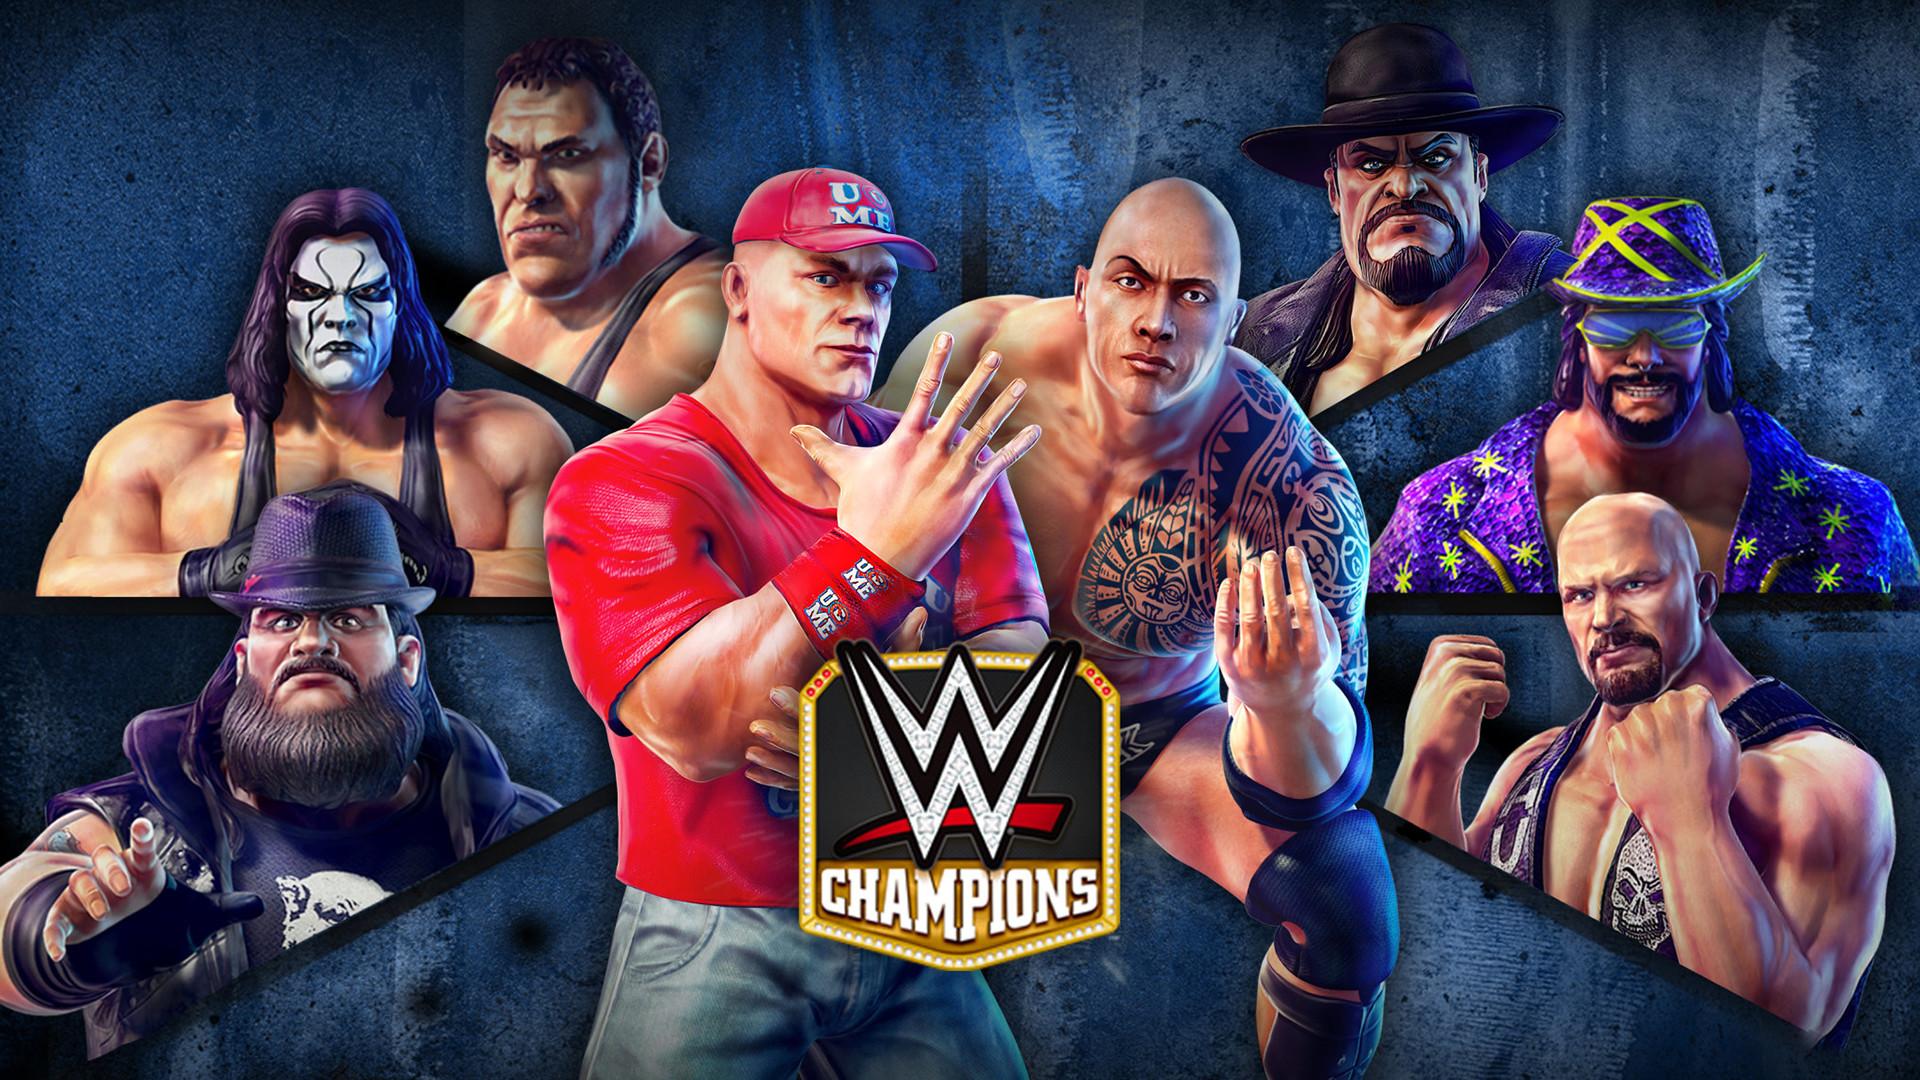 WWE Champions Wallpaper